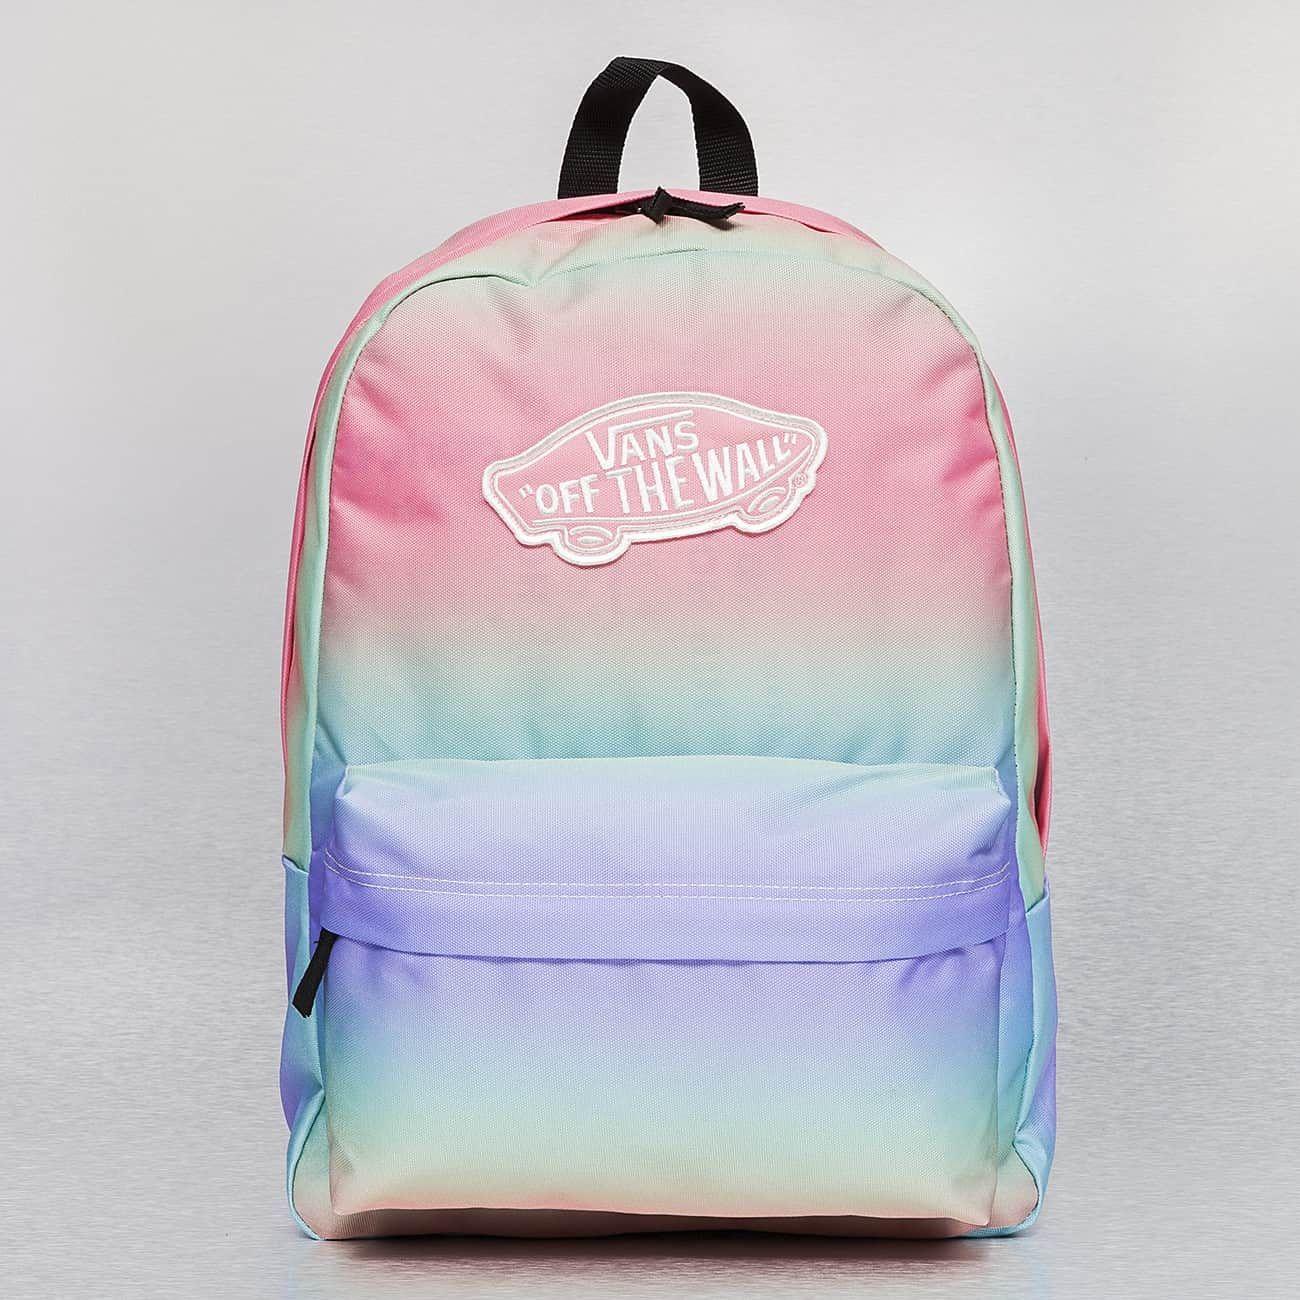 BACKPACK- BACK TO SCHOOL VANS | DIY projects | Pinterest | Backpacks, Vans  and School